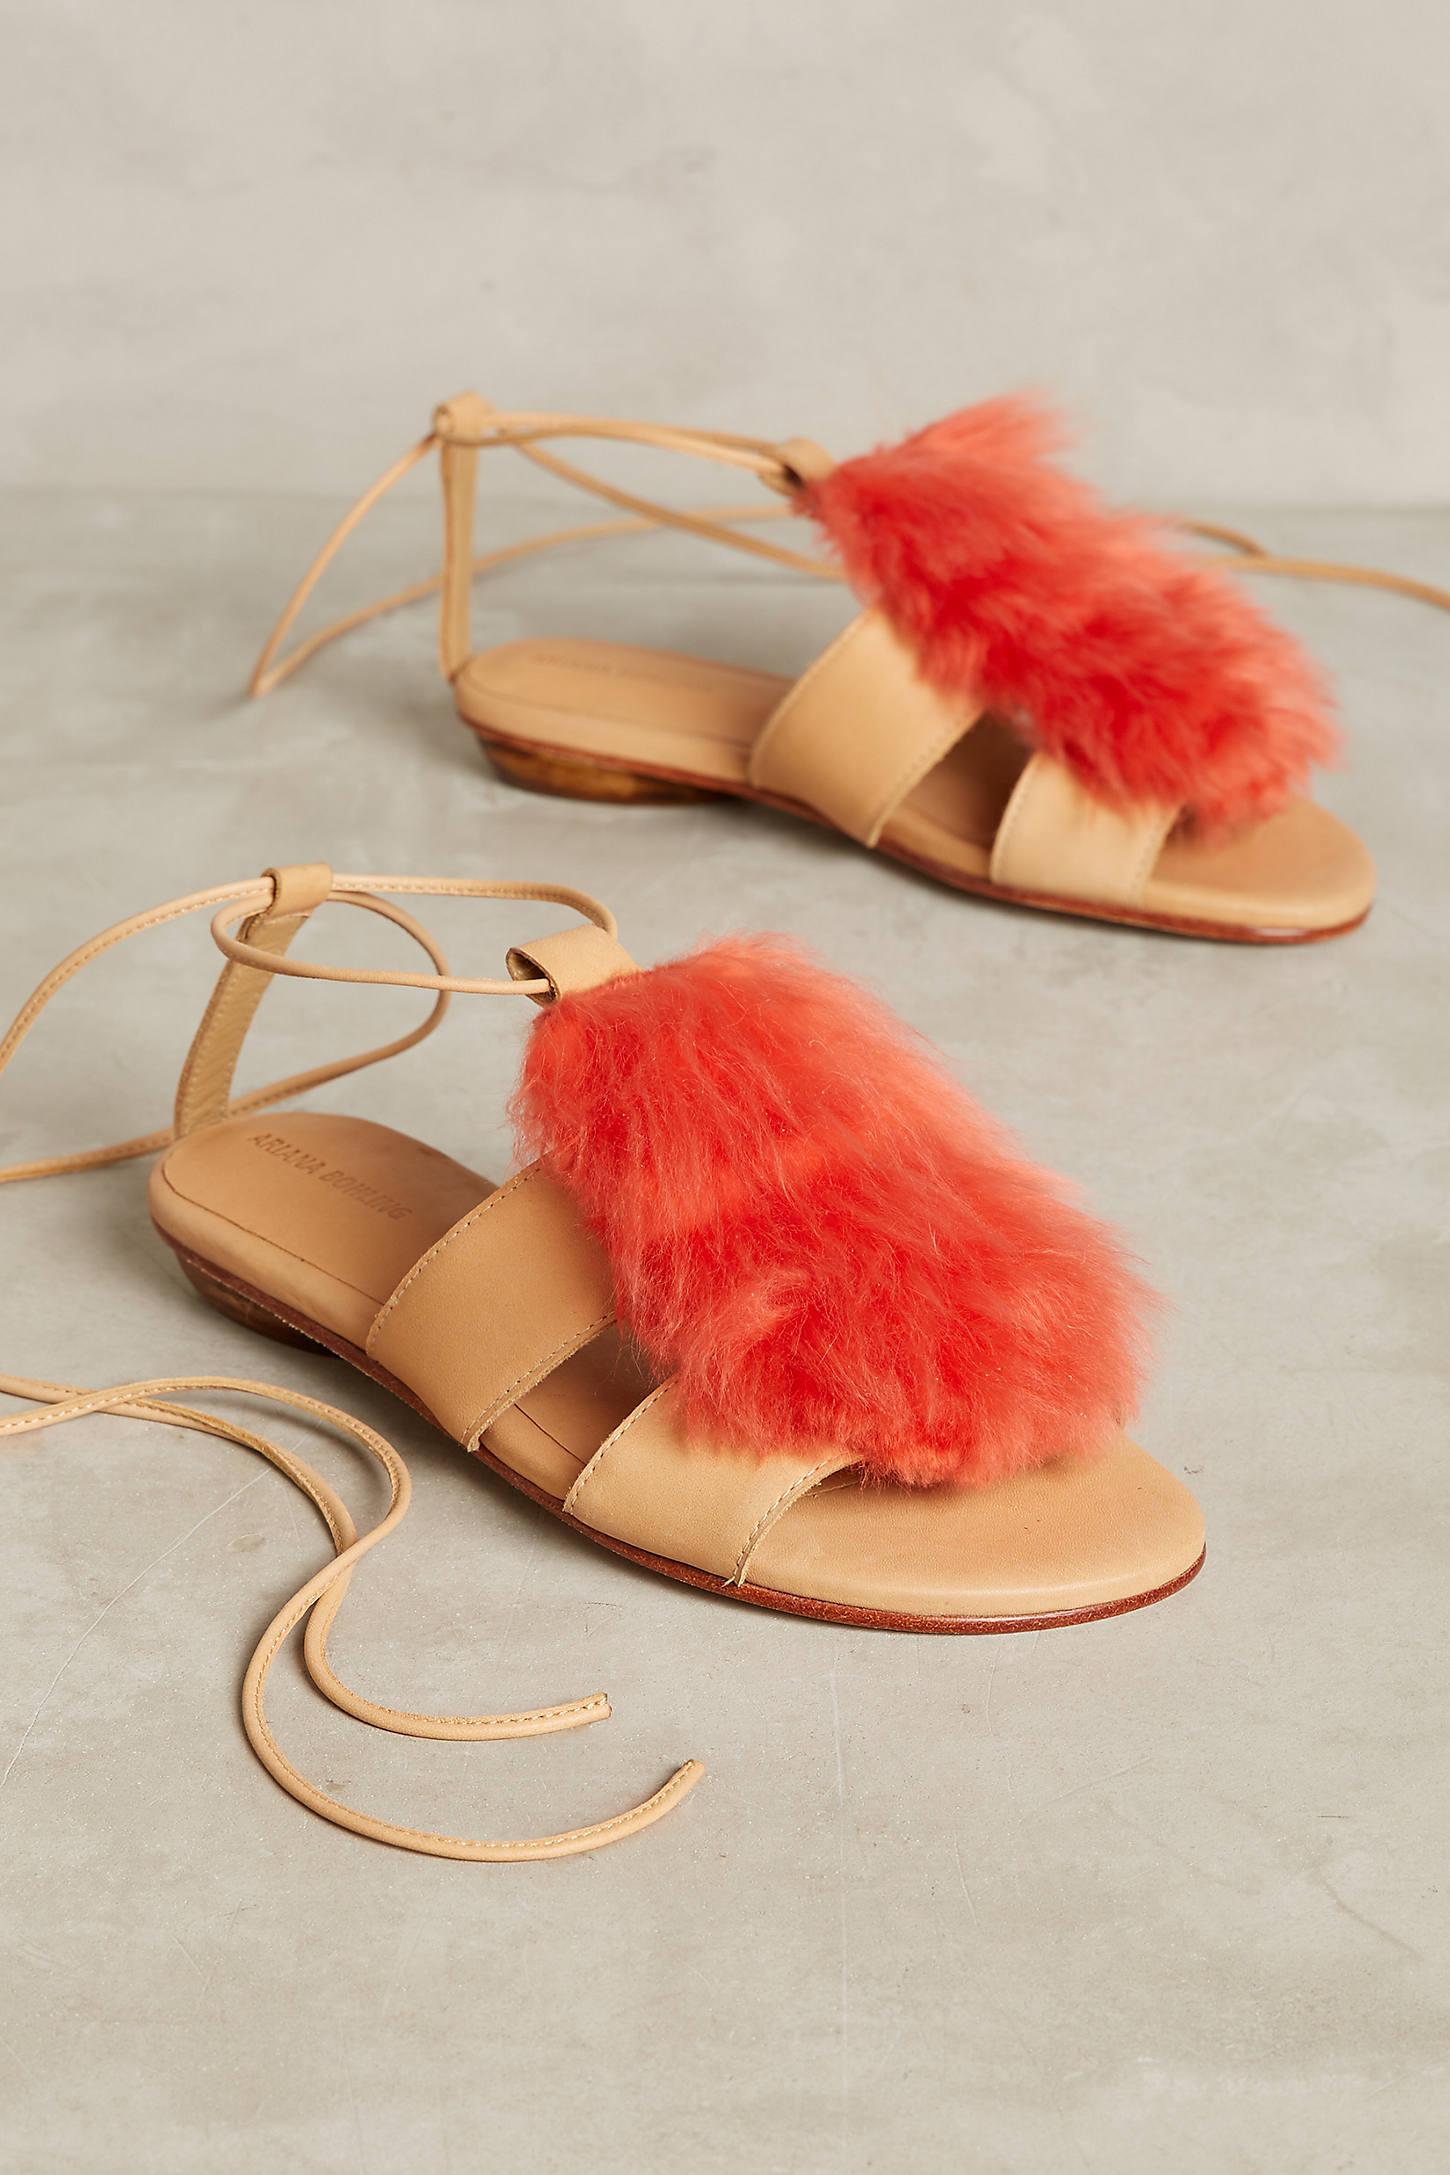 Ariana Bohling Pip Gladiator Sandals